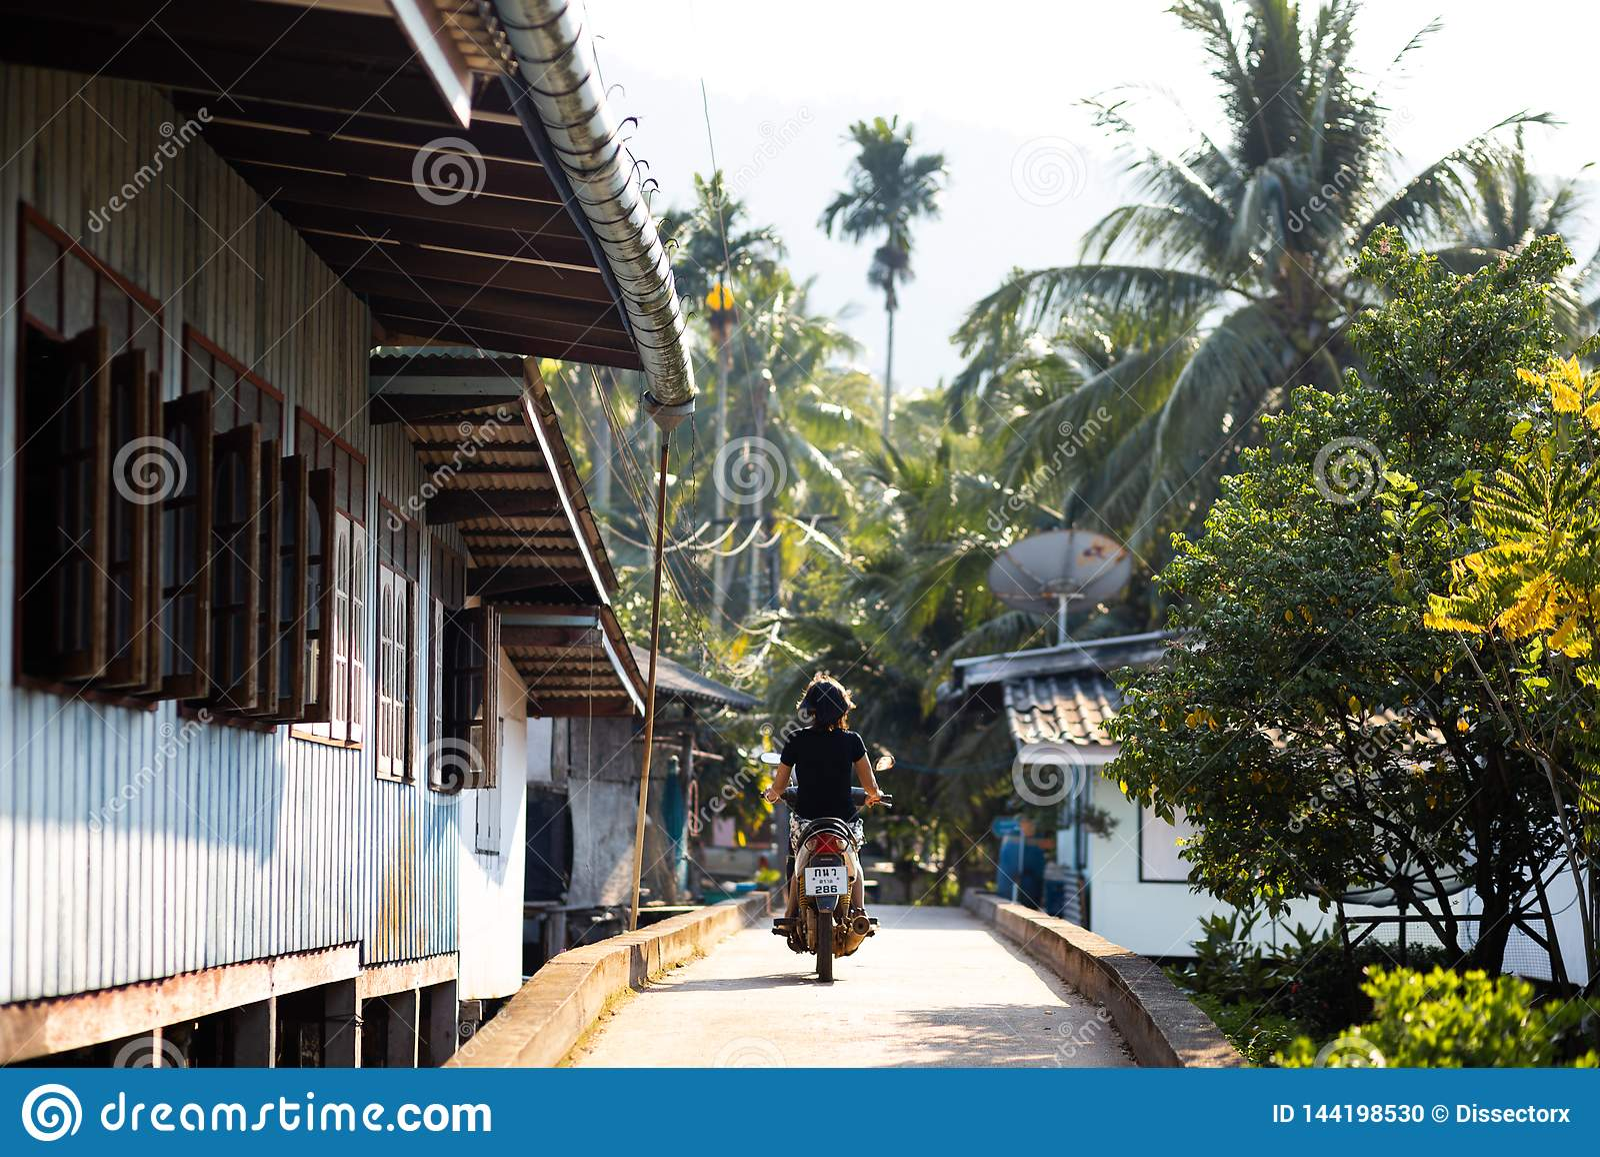 KO CHANG, ΤΑΪΛΆΝΔΗ - 10 ΑΠΡΙΛΊΟΥ 2018: Χωριό των αυθεντικών παραδοσιακών ψαράδων στο νησί - άνθρωποι και παιδιά μέσα